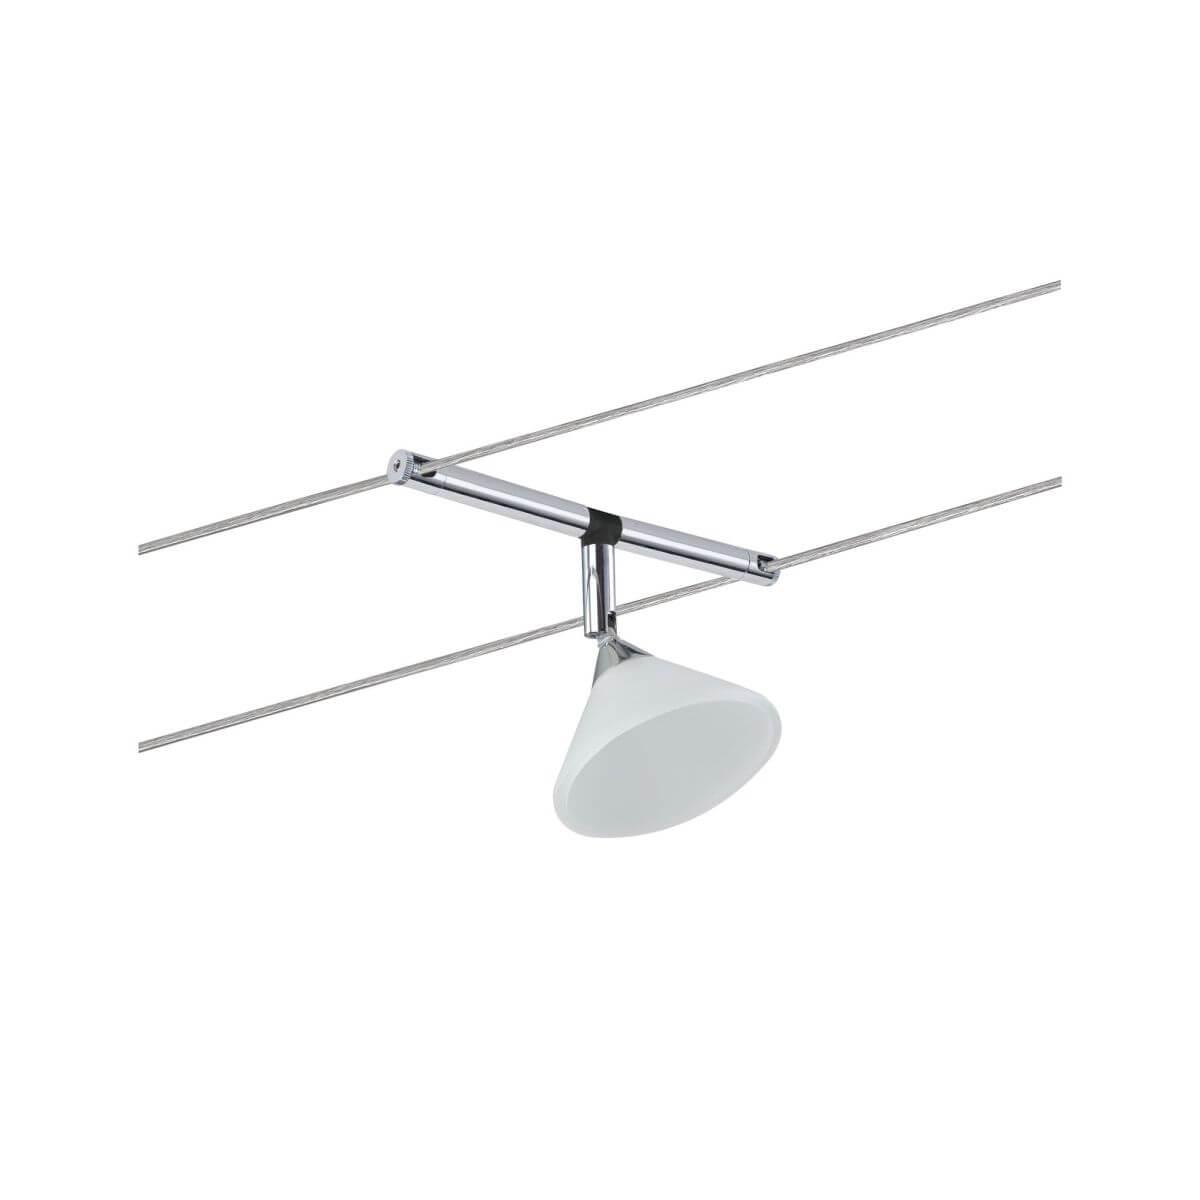 Paulmann Seilspot Colmar Chrom ohne Leuchtmittel, 12 V AC, max 10 W GU4